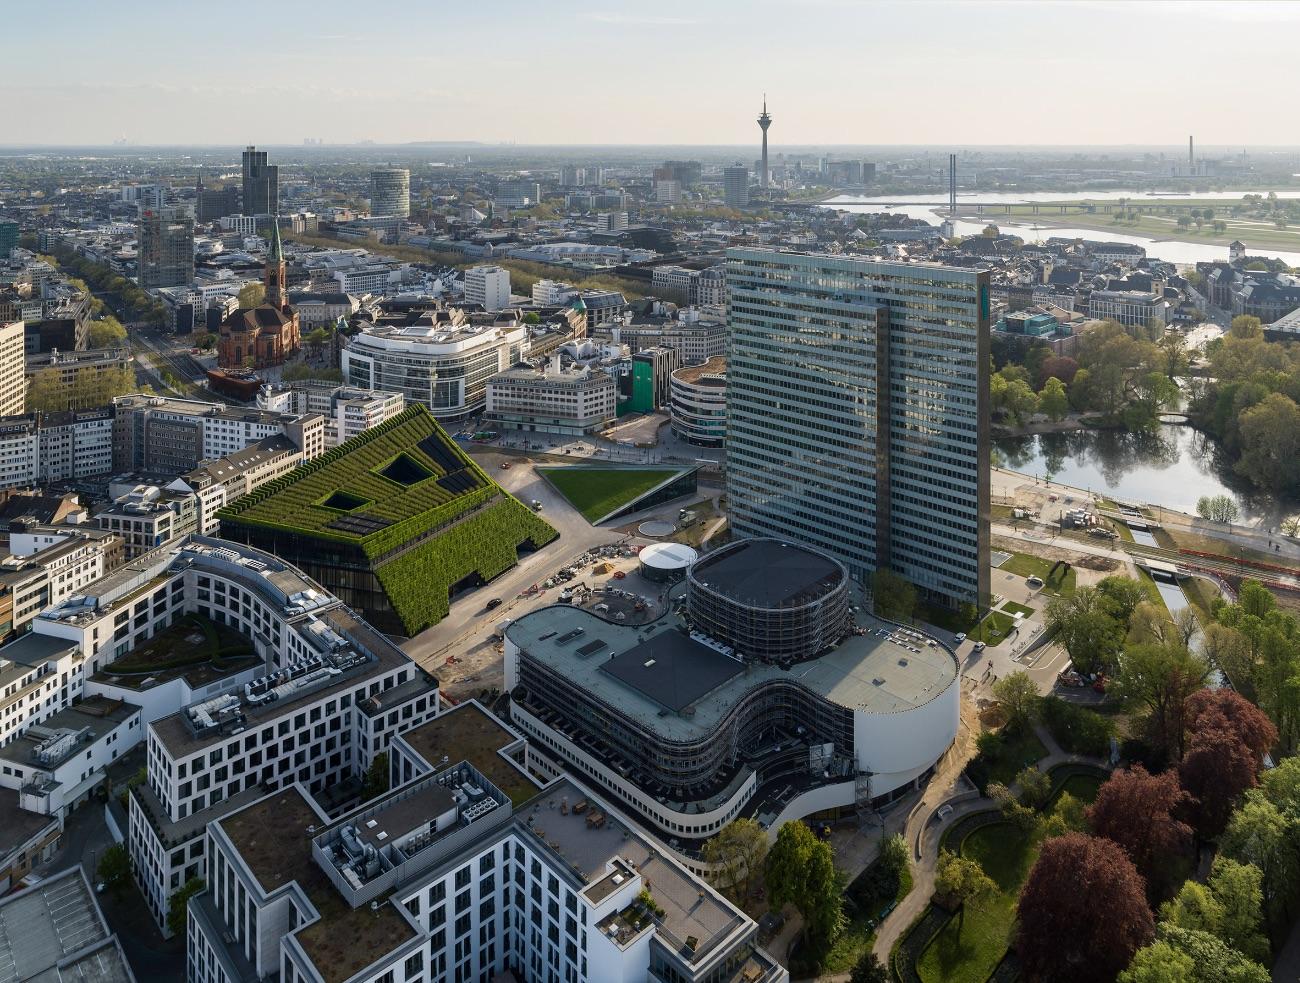 2_ingenhoven architects_Kö-Bogen II Düsseldorf_Inspirationist